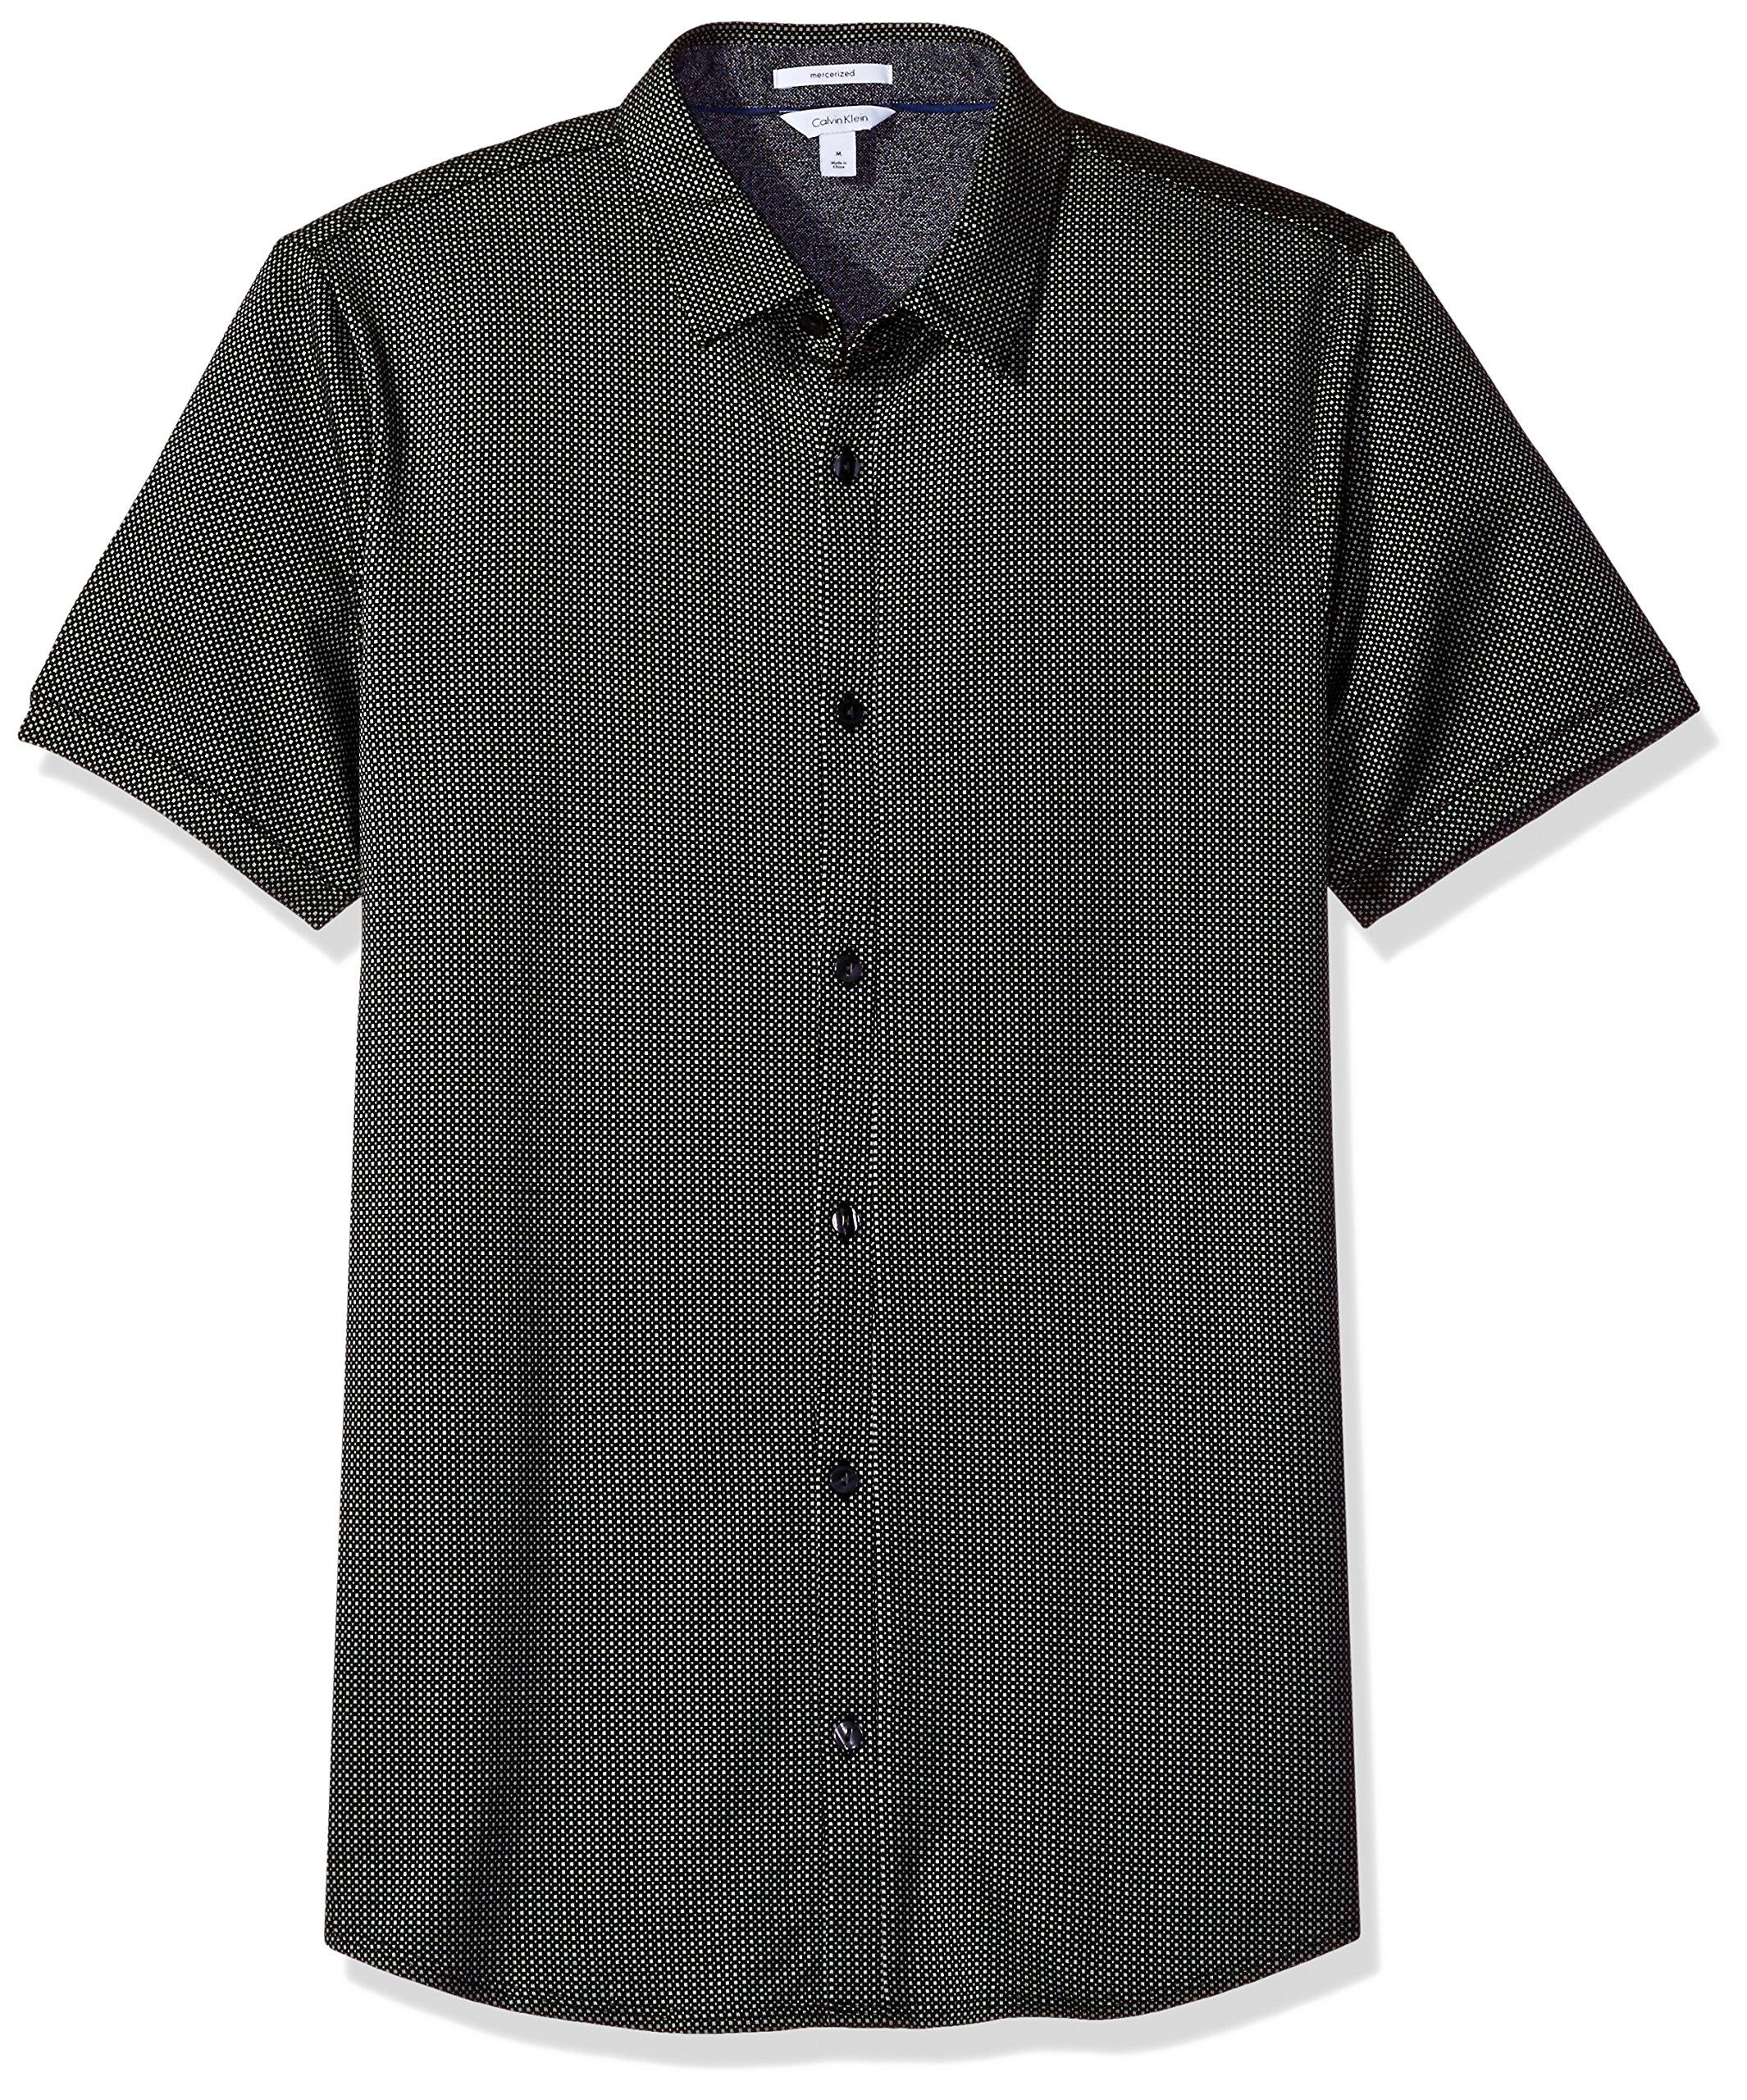 Calvin Klein Men's Textured Jacquard Coat Front Shirt, Black, Small